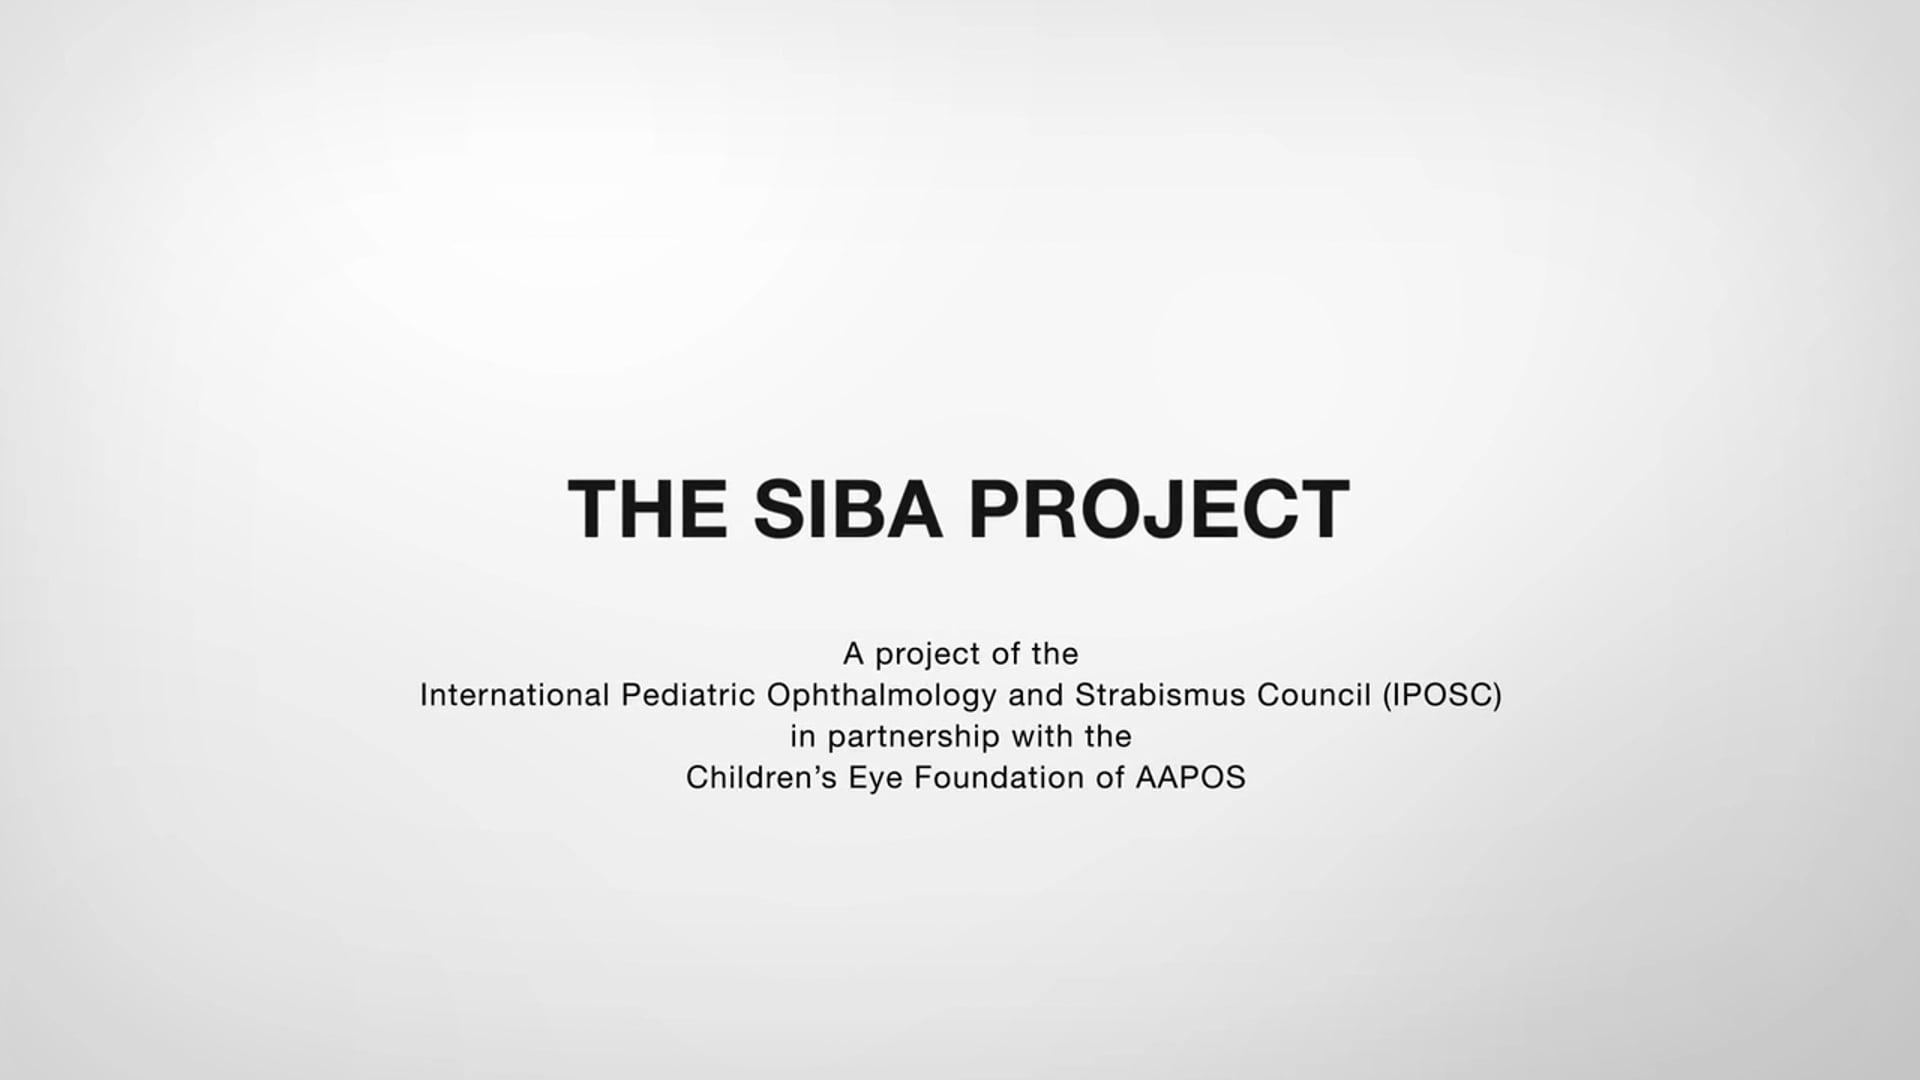 THE SIBA PROJECT (TRT 5:30)